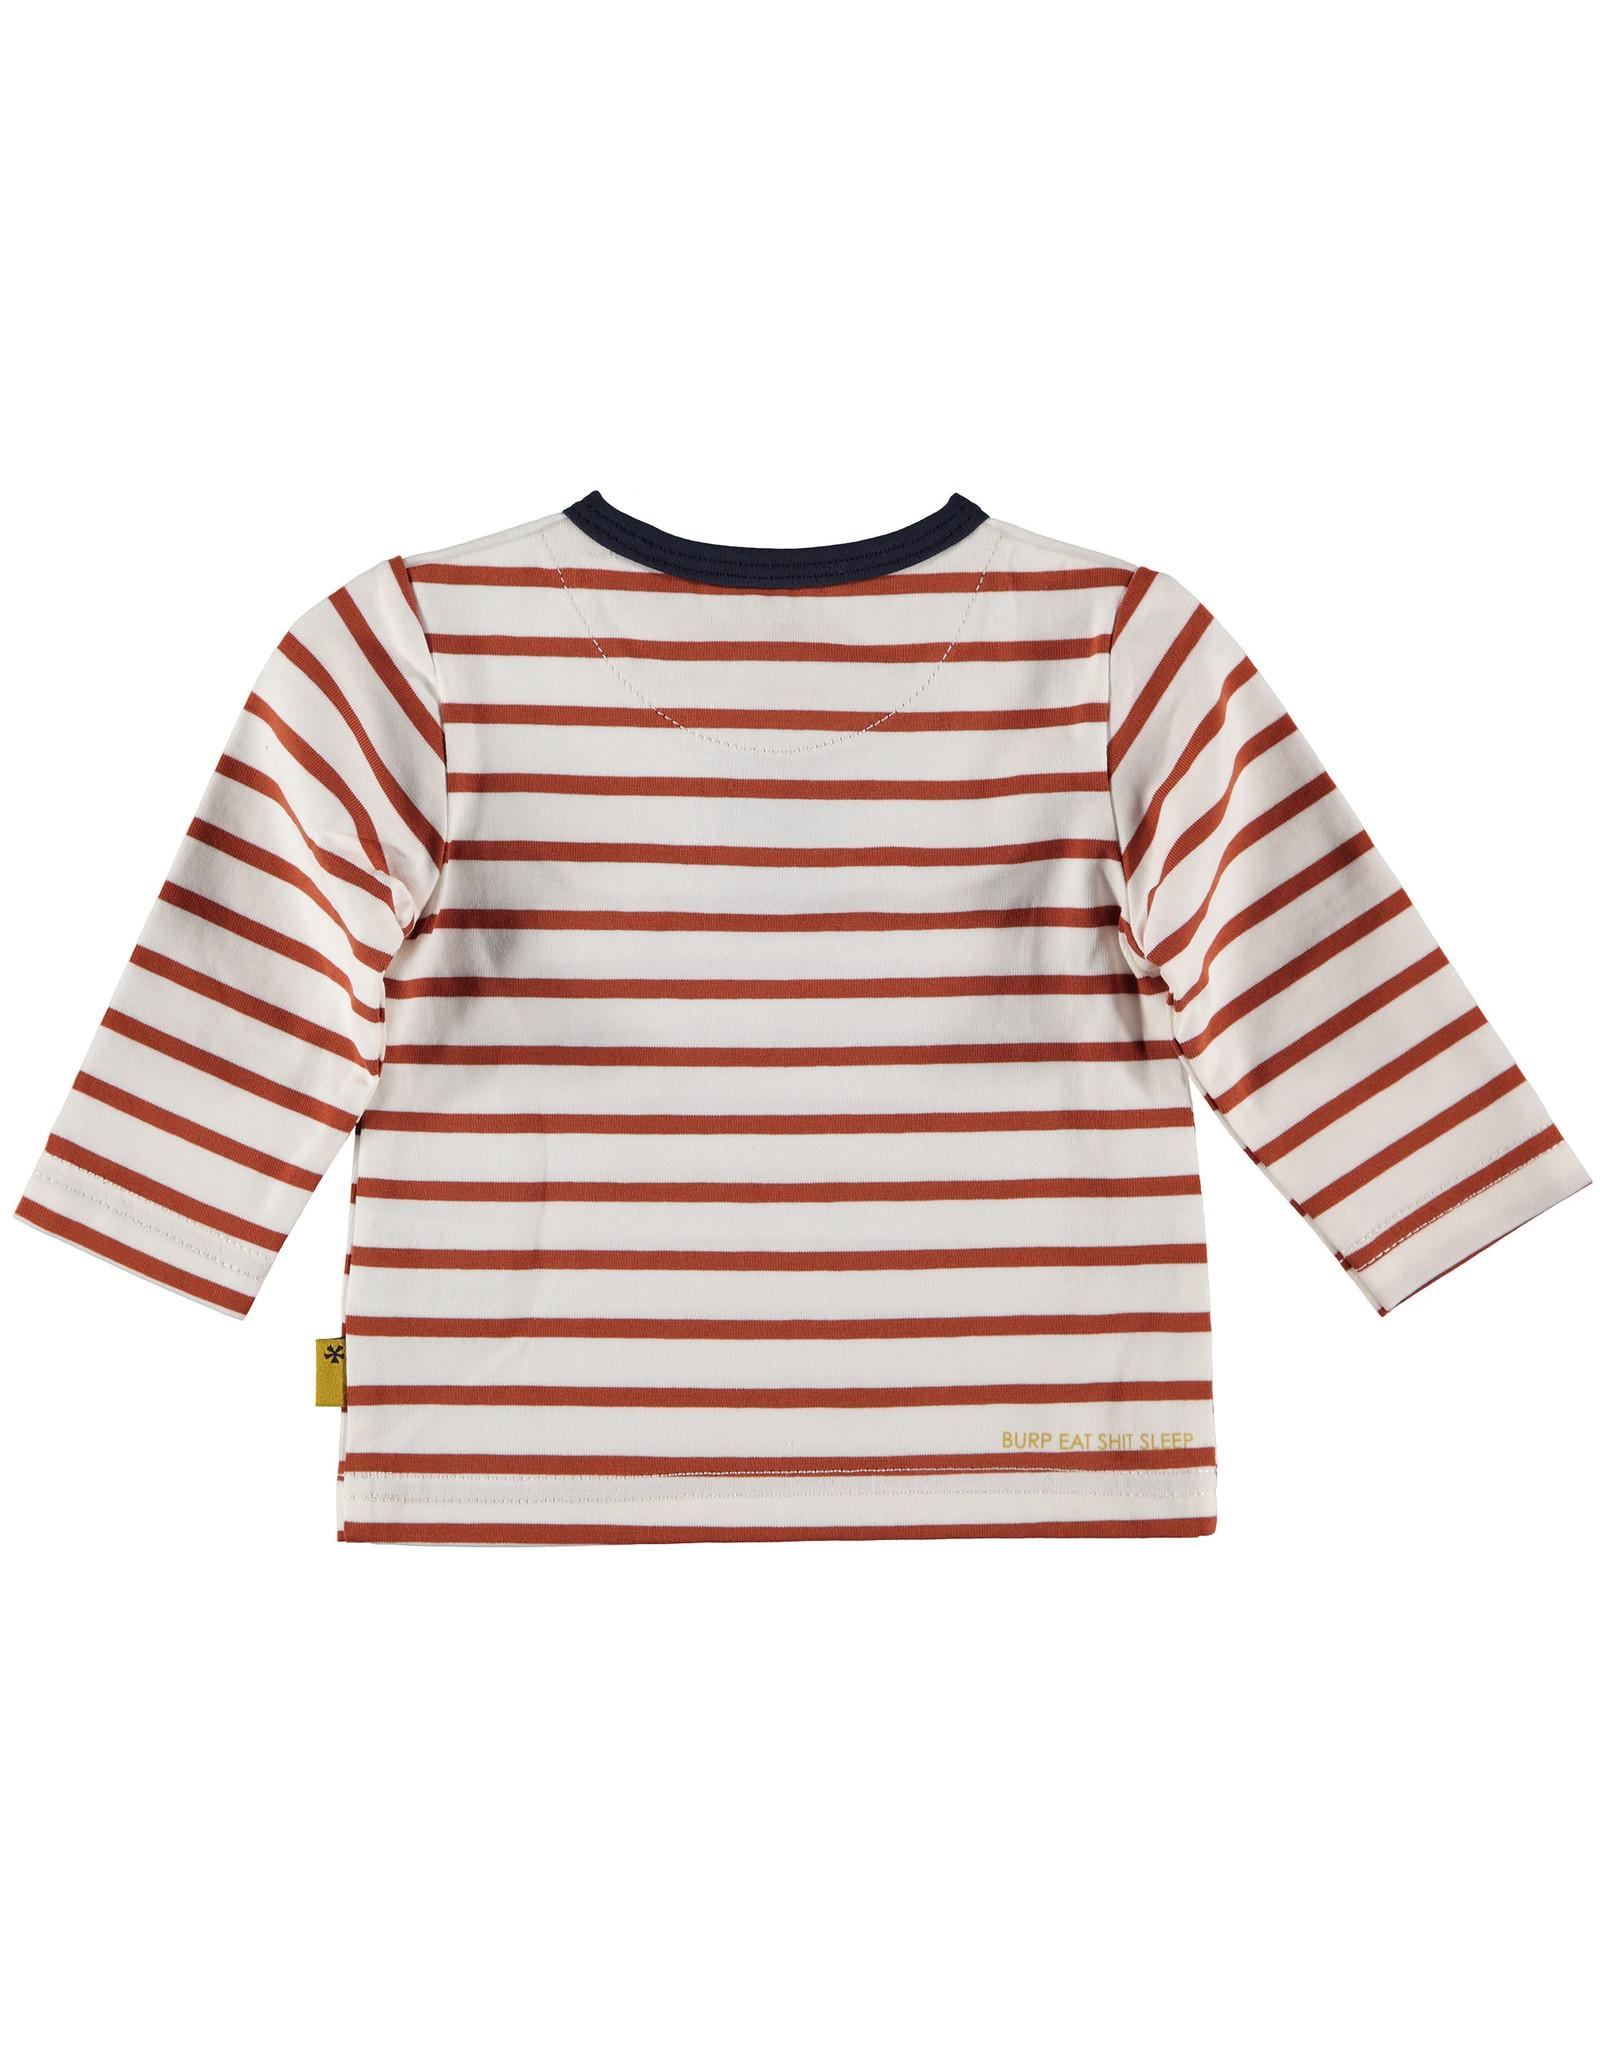 BESS Shirt Henley l sl. Striped White